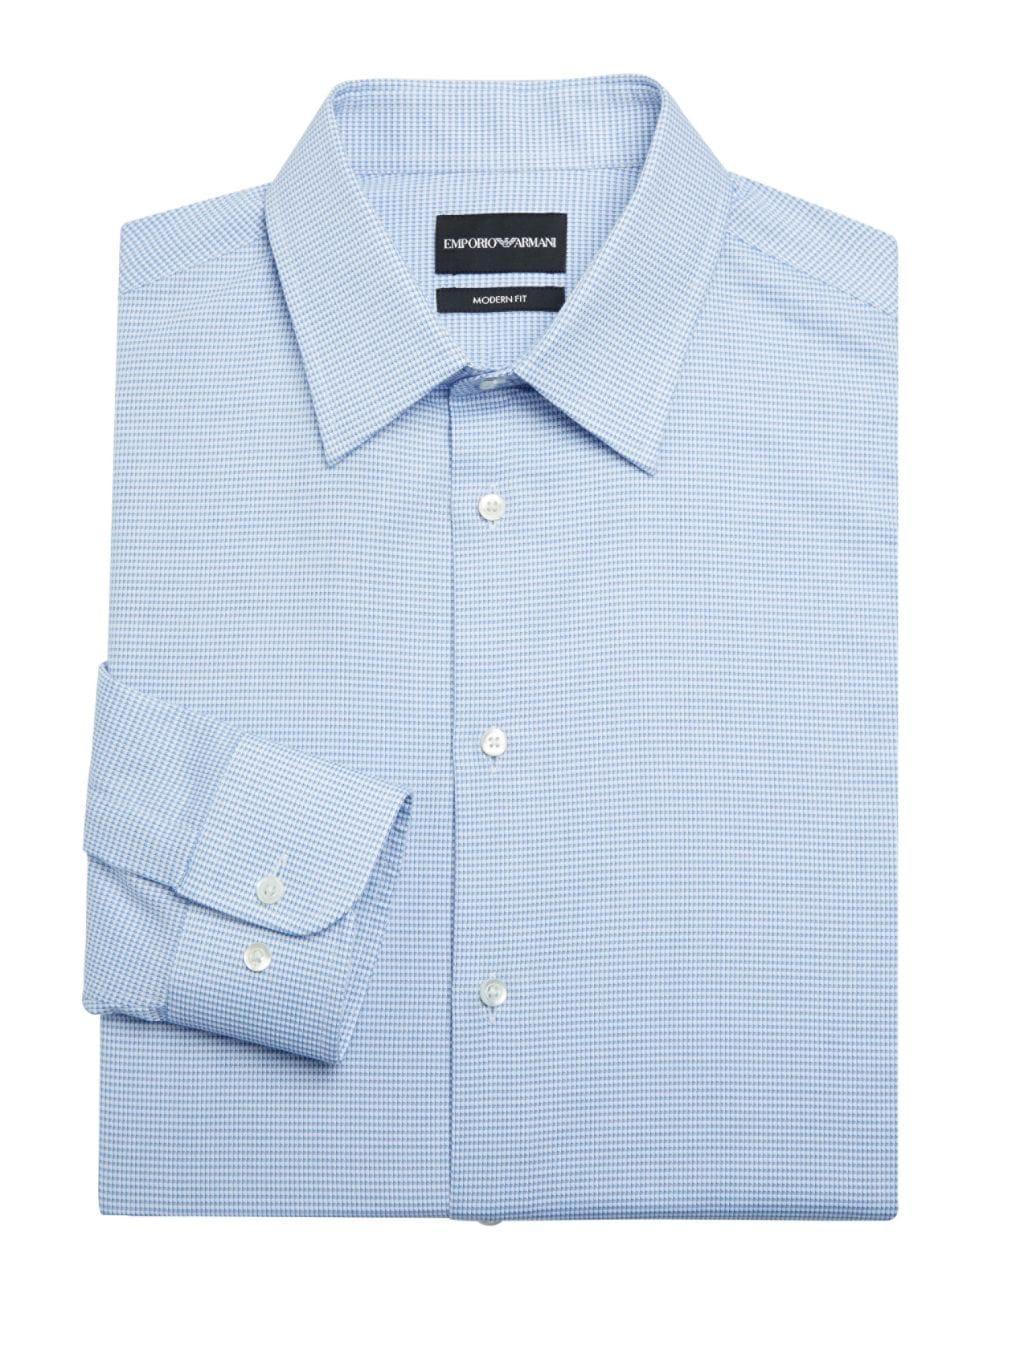 Emporio Armani Modern-Fit Cotton Button-Down Shirt